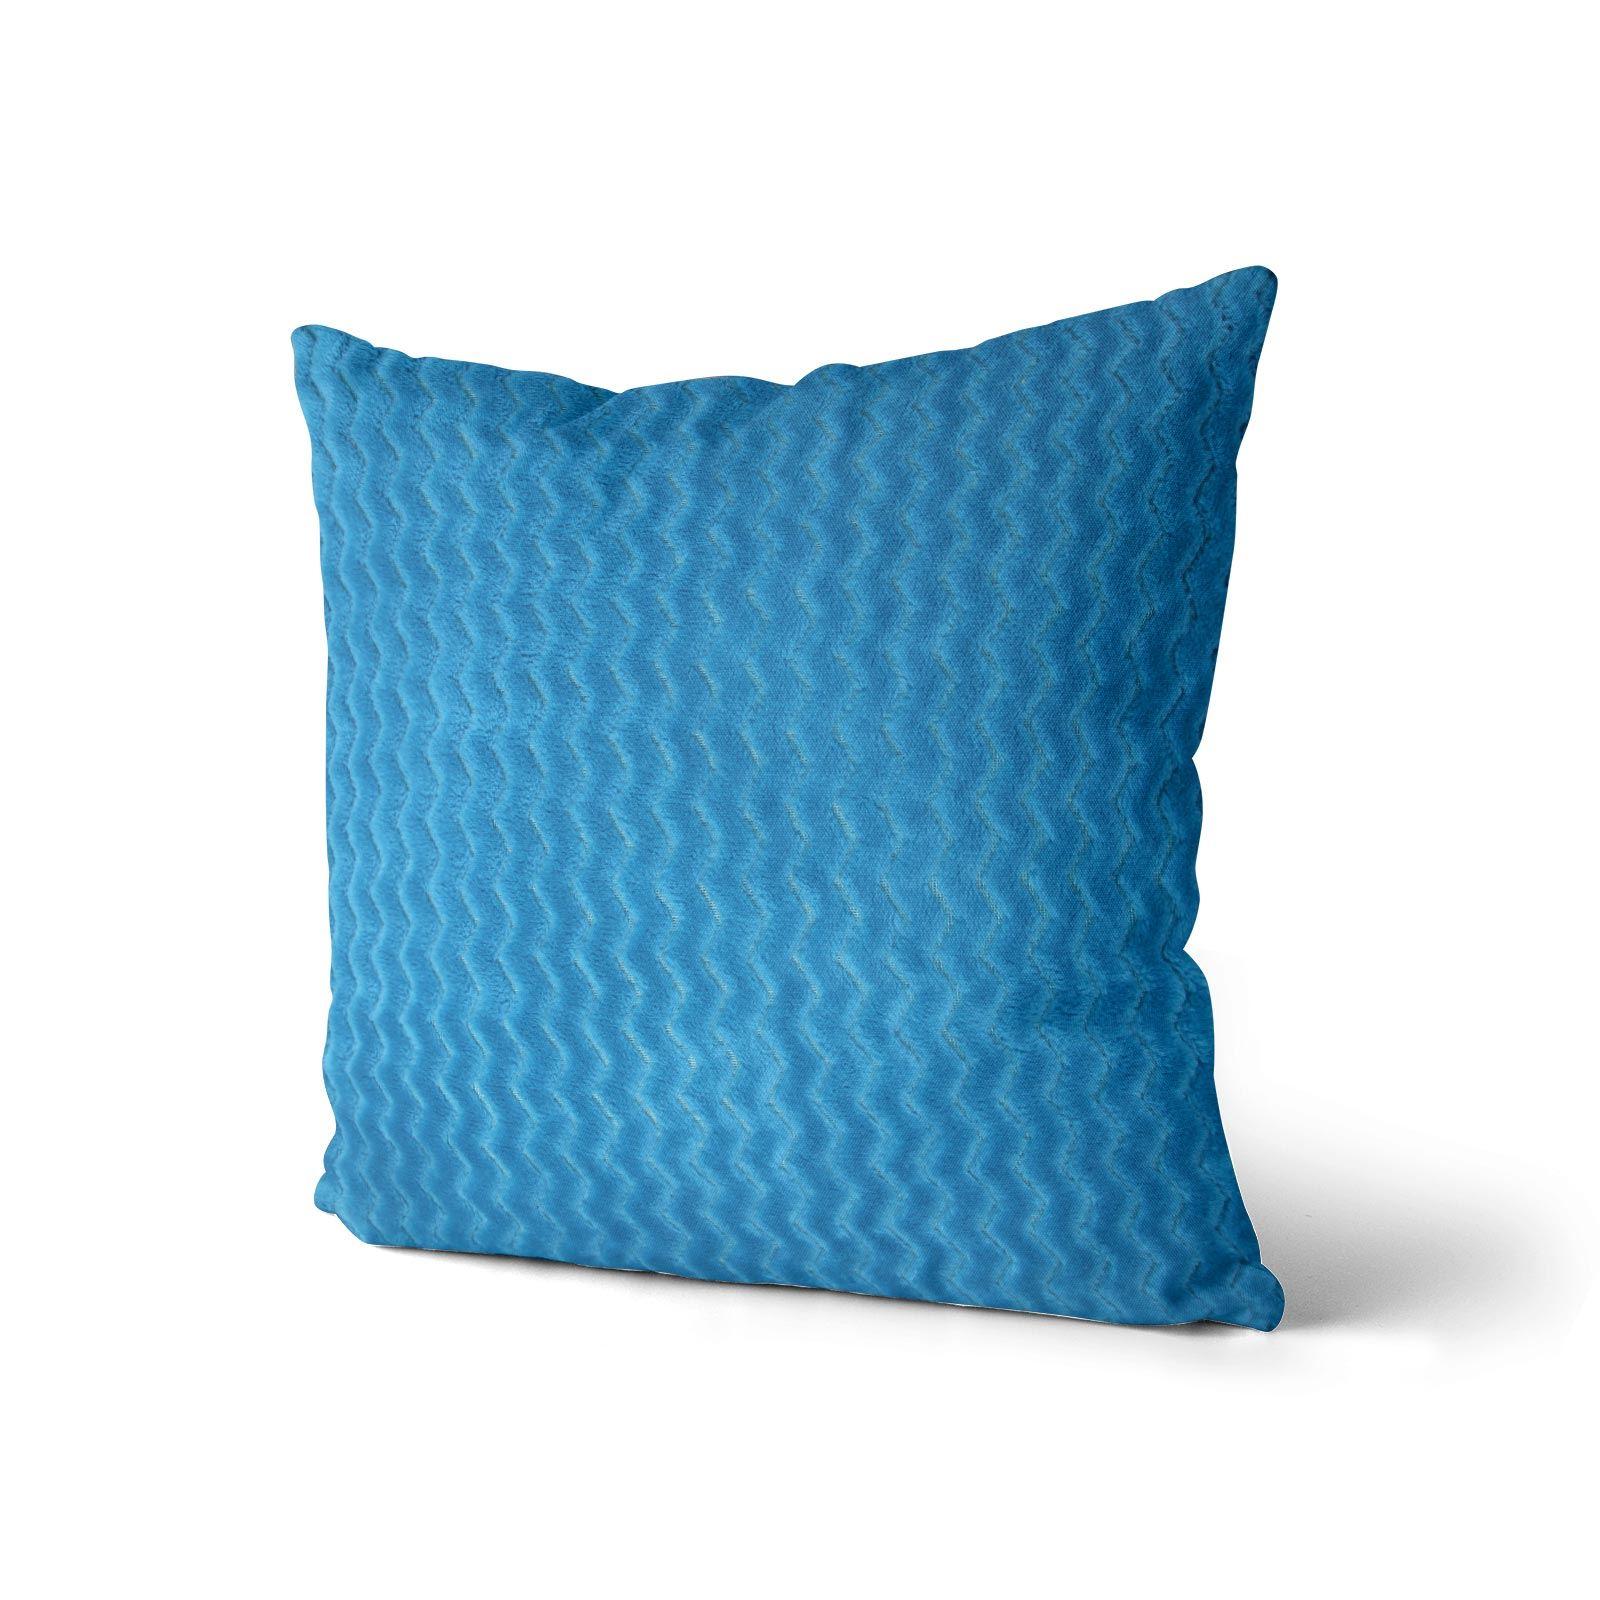 Teal-Blue-Duck-Egg-Cushion-Covers-18-034-x18-034-45cm-x-45cm-Luxury-Cover thumbnail 35